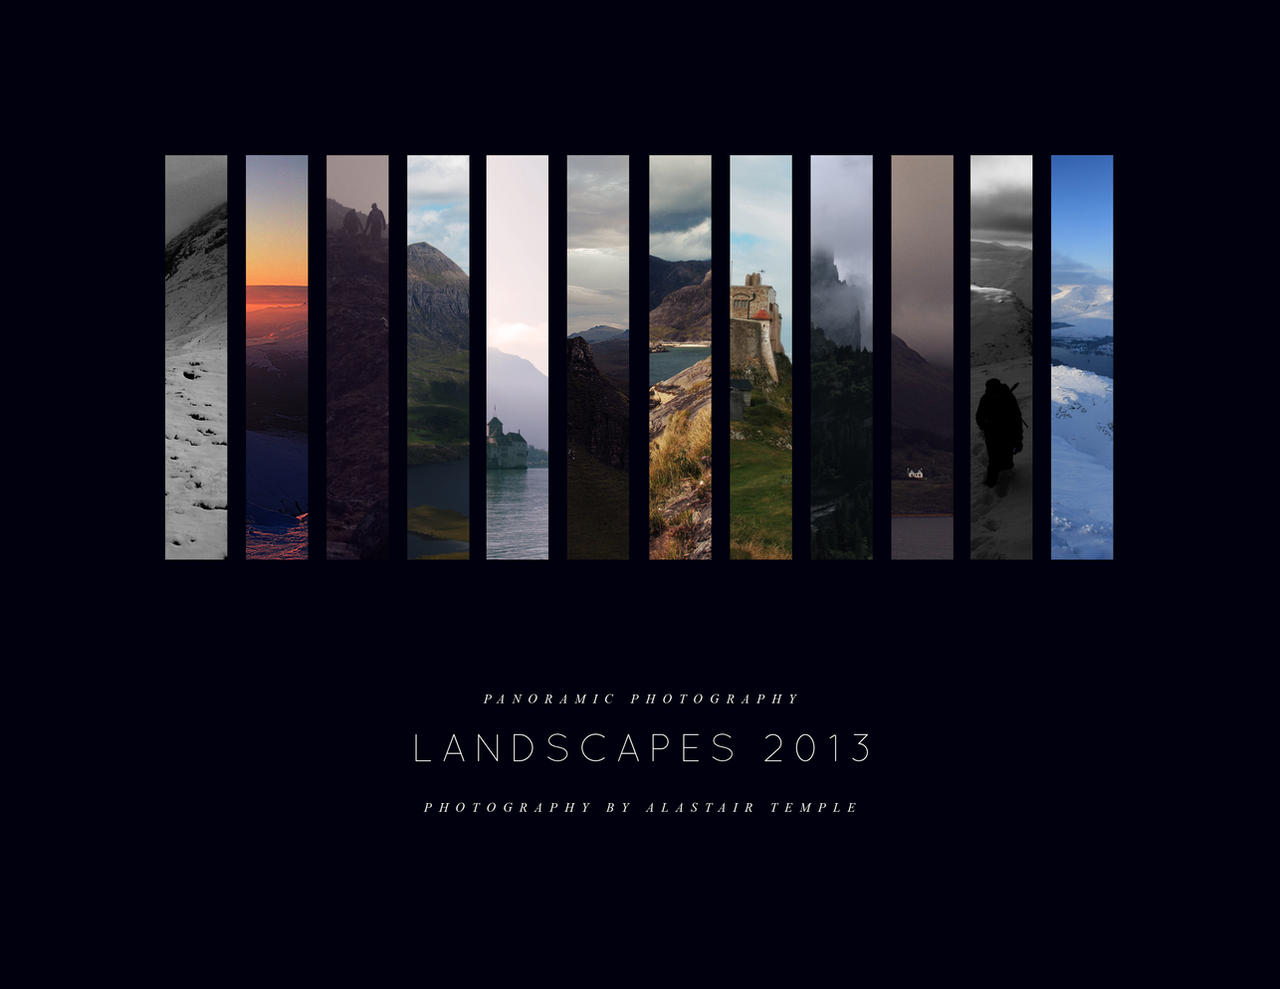 2013 Landscape Photography Calendar by Smiling-Demon on DeviantArt